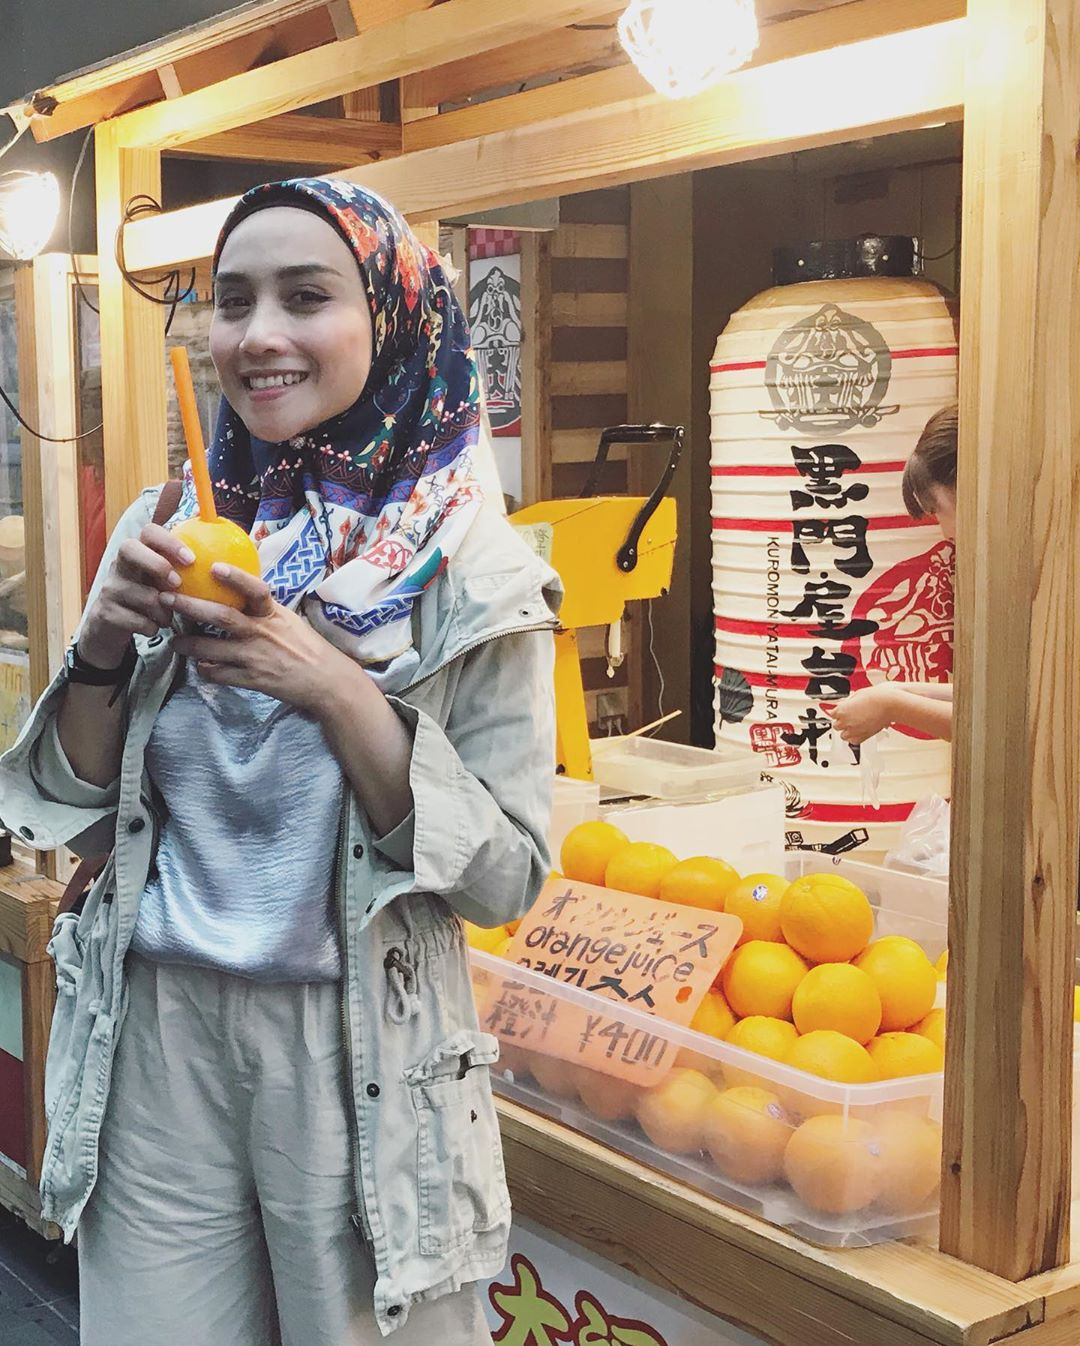 Tampil Dengan Imej Berhijab, Wan Sharmila Tak Takut Pun Kalau 'Kurang' Job